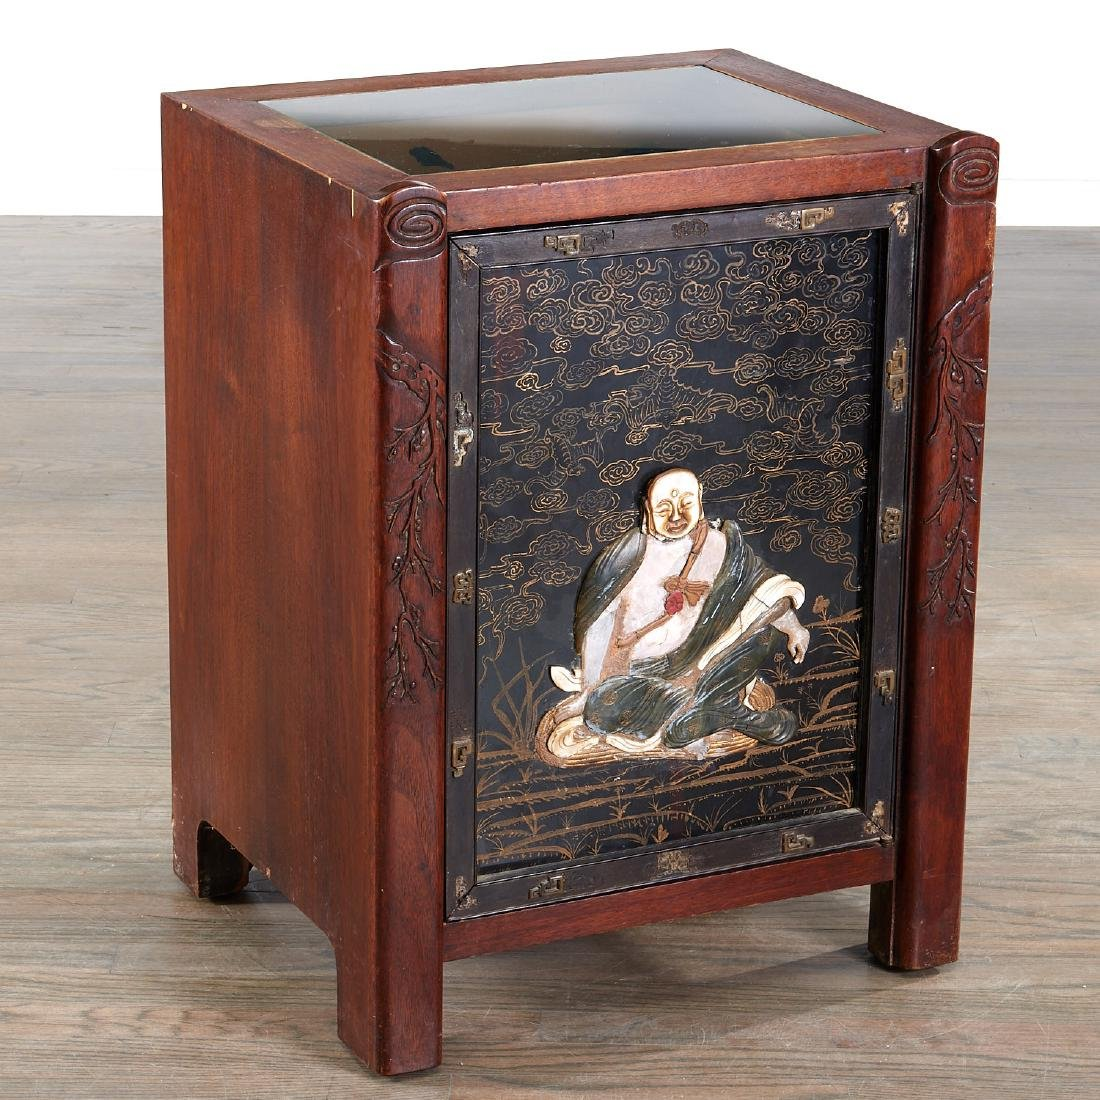 Chinese jade inlaid hardwood cabinet